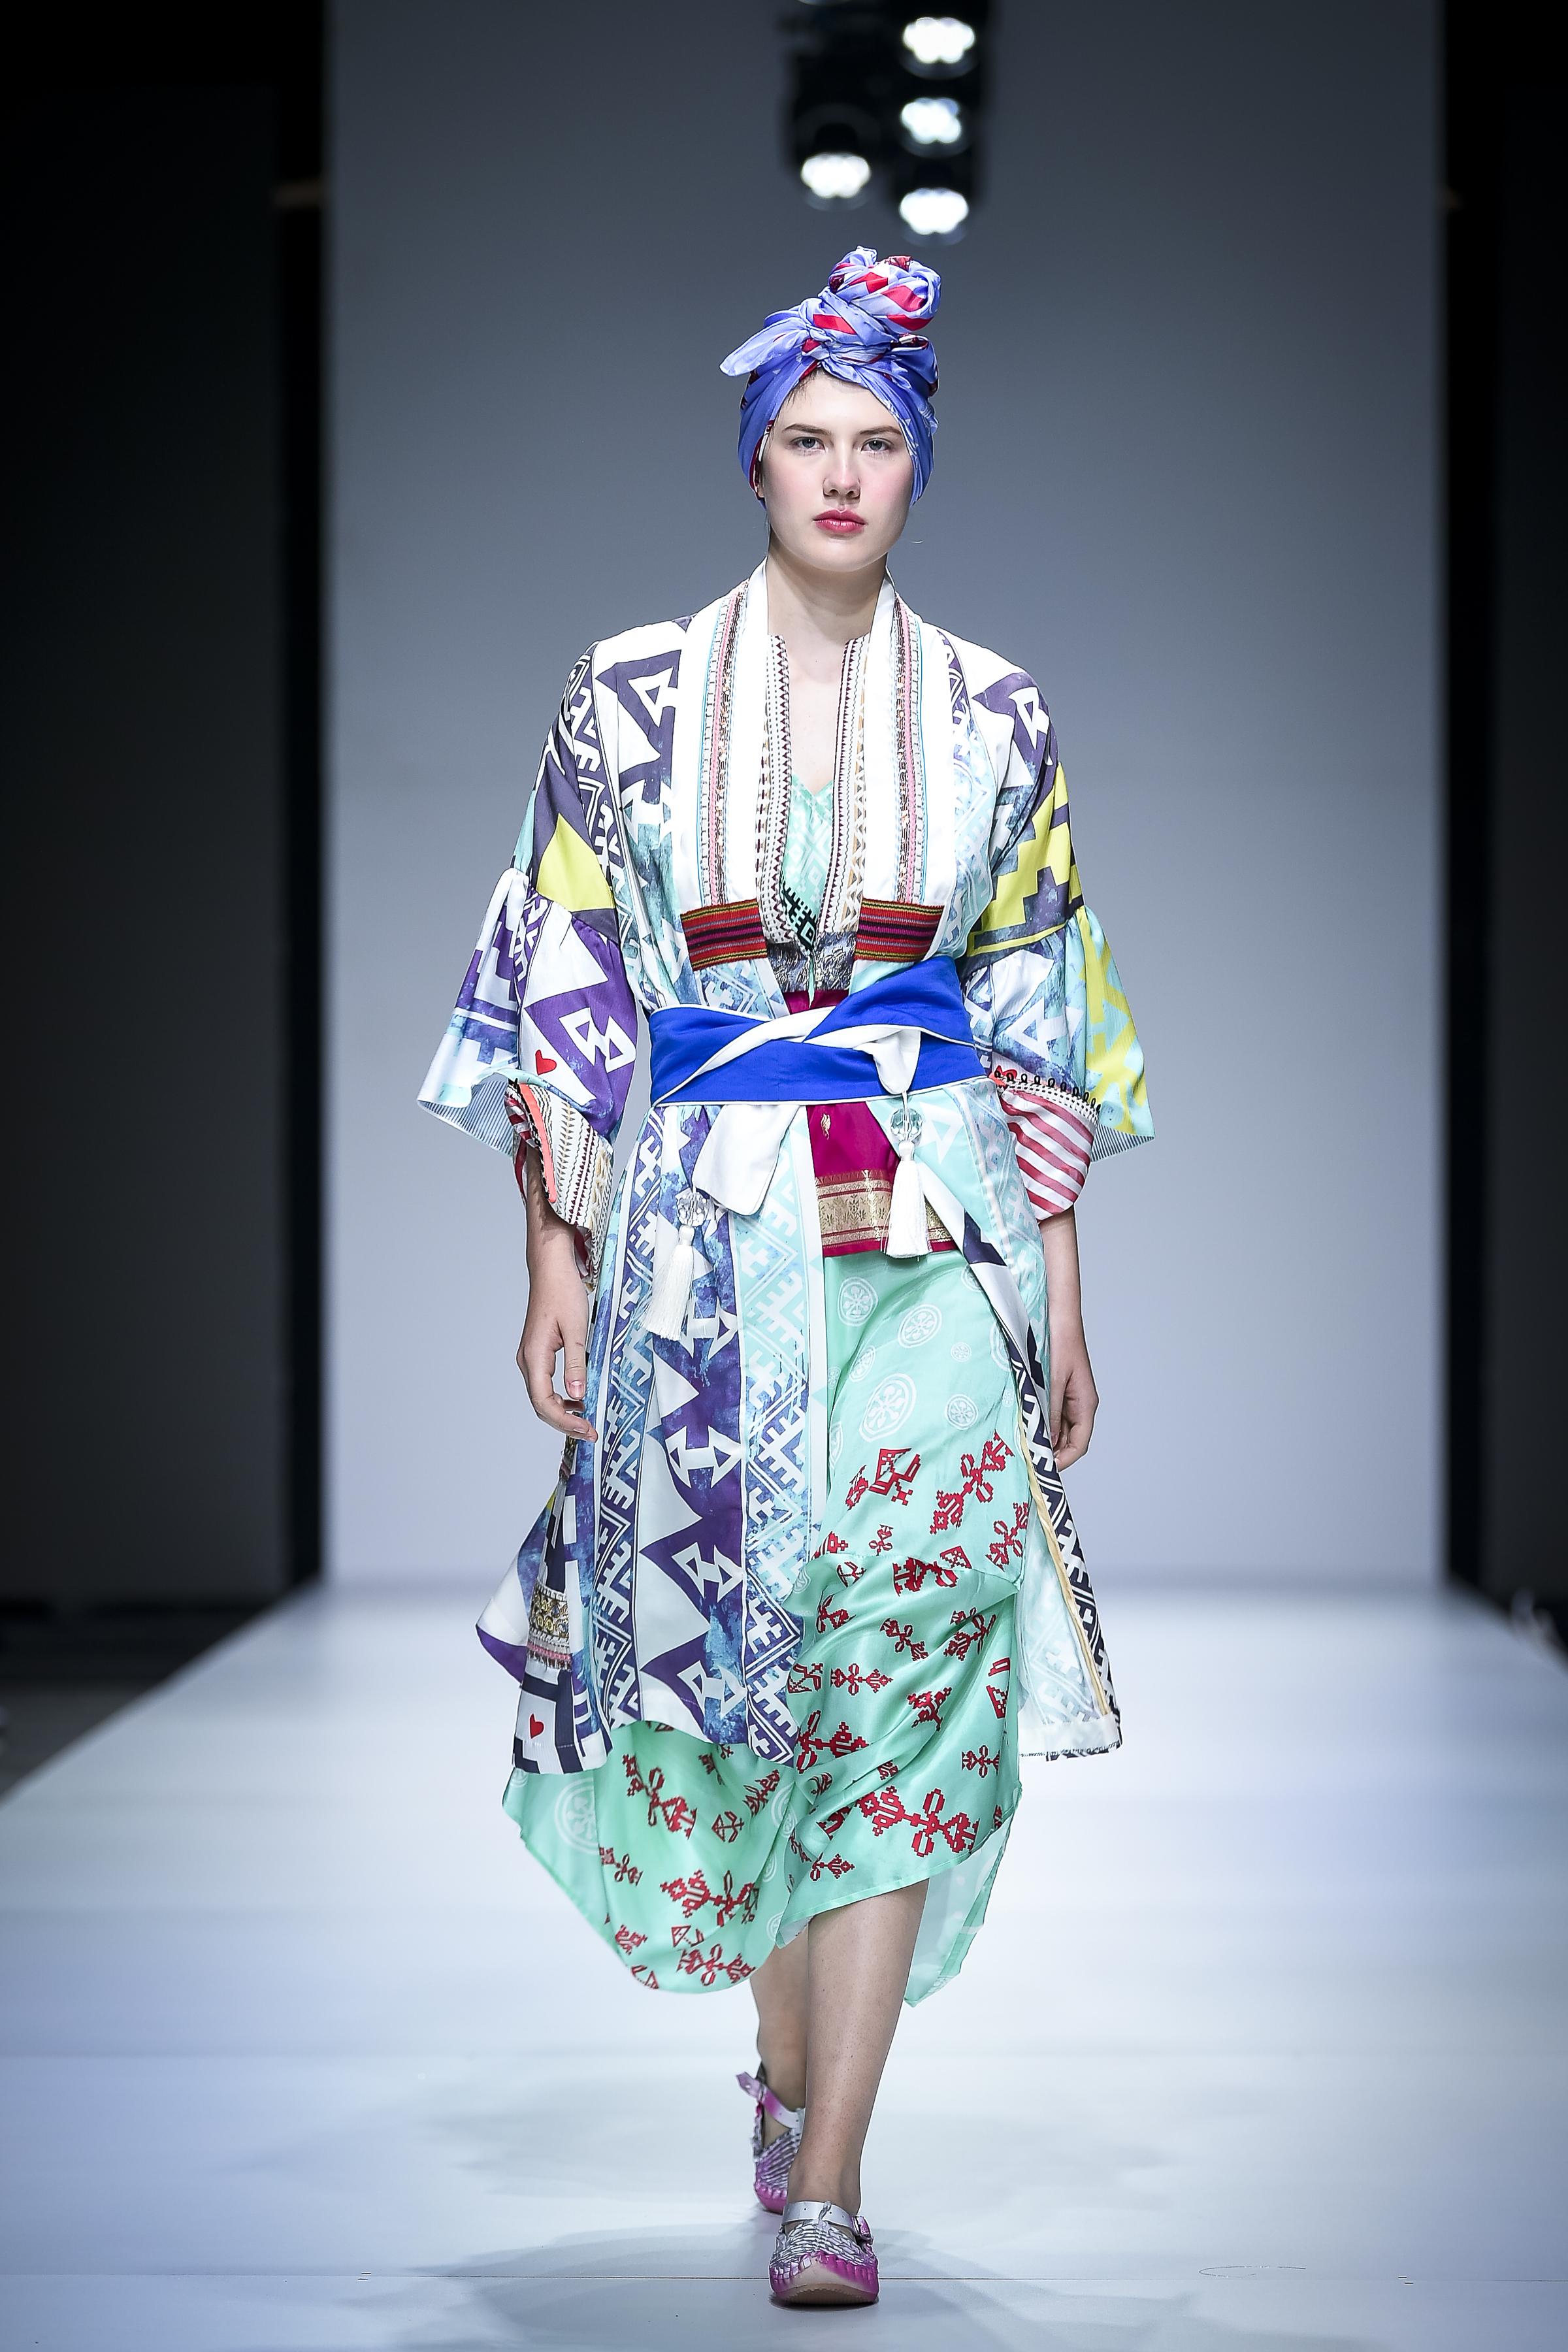 LJFW apr19 Day1 photoJureMakovec 209 Gala Borović pobednica Fashion Scout SEE konkursa